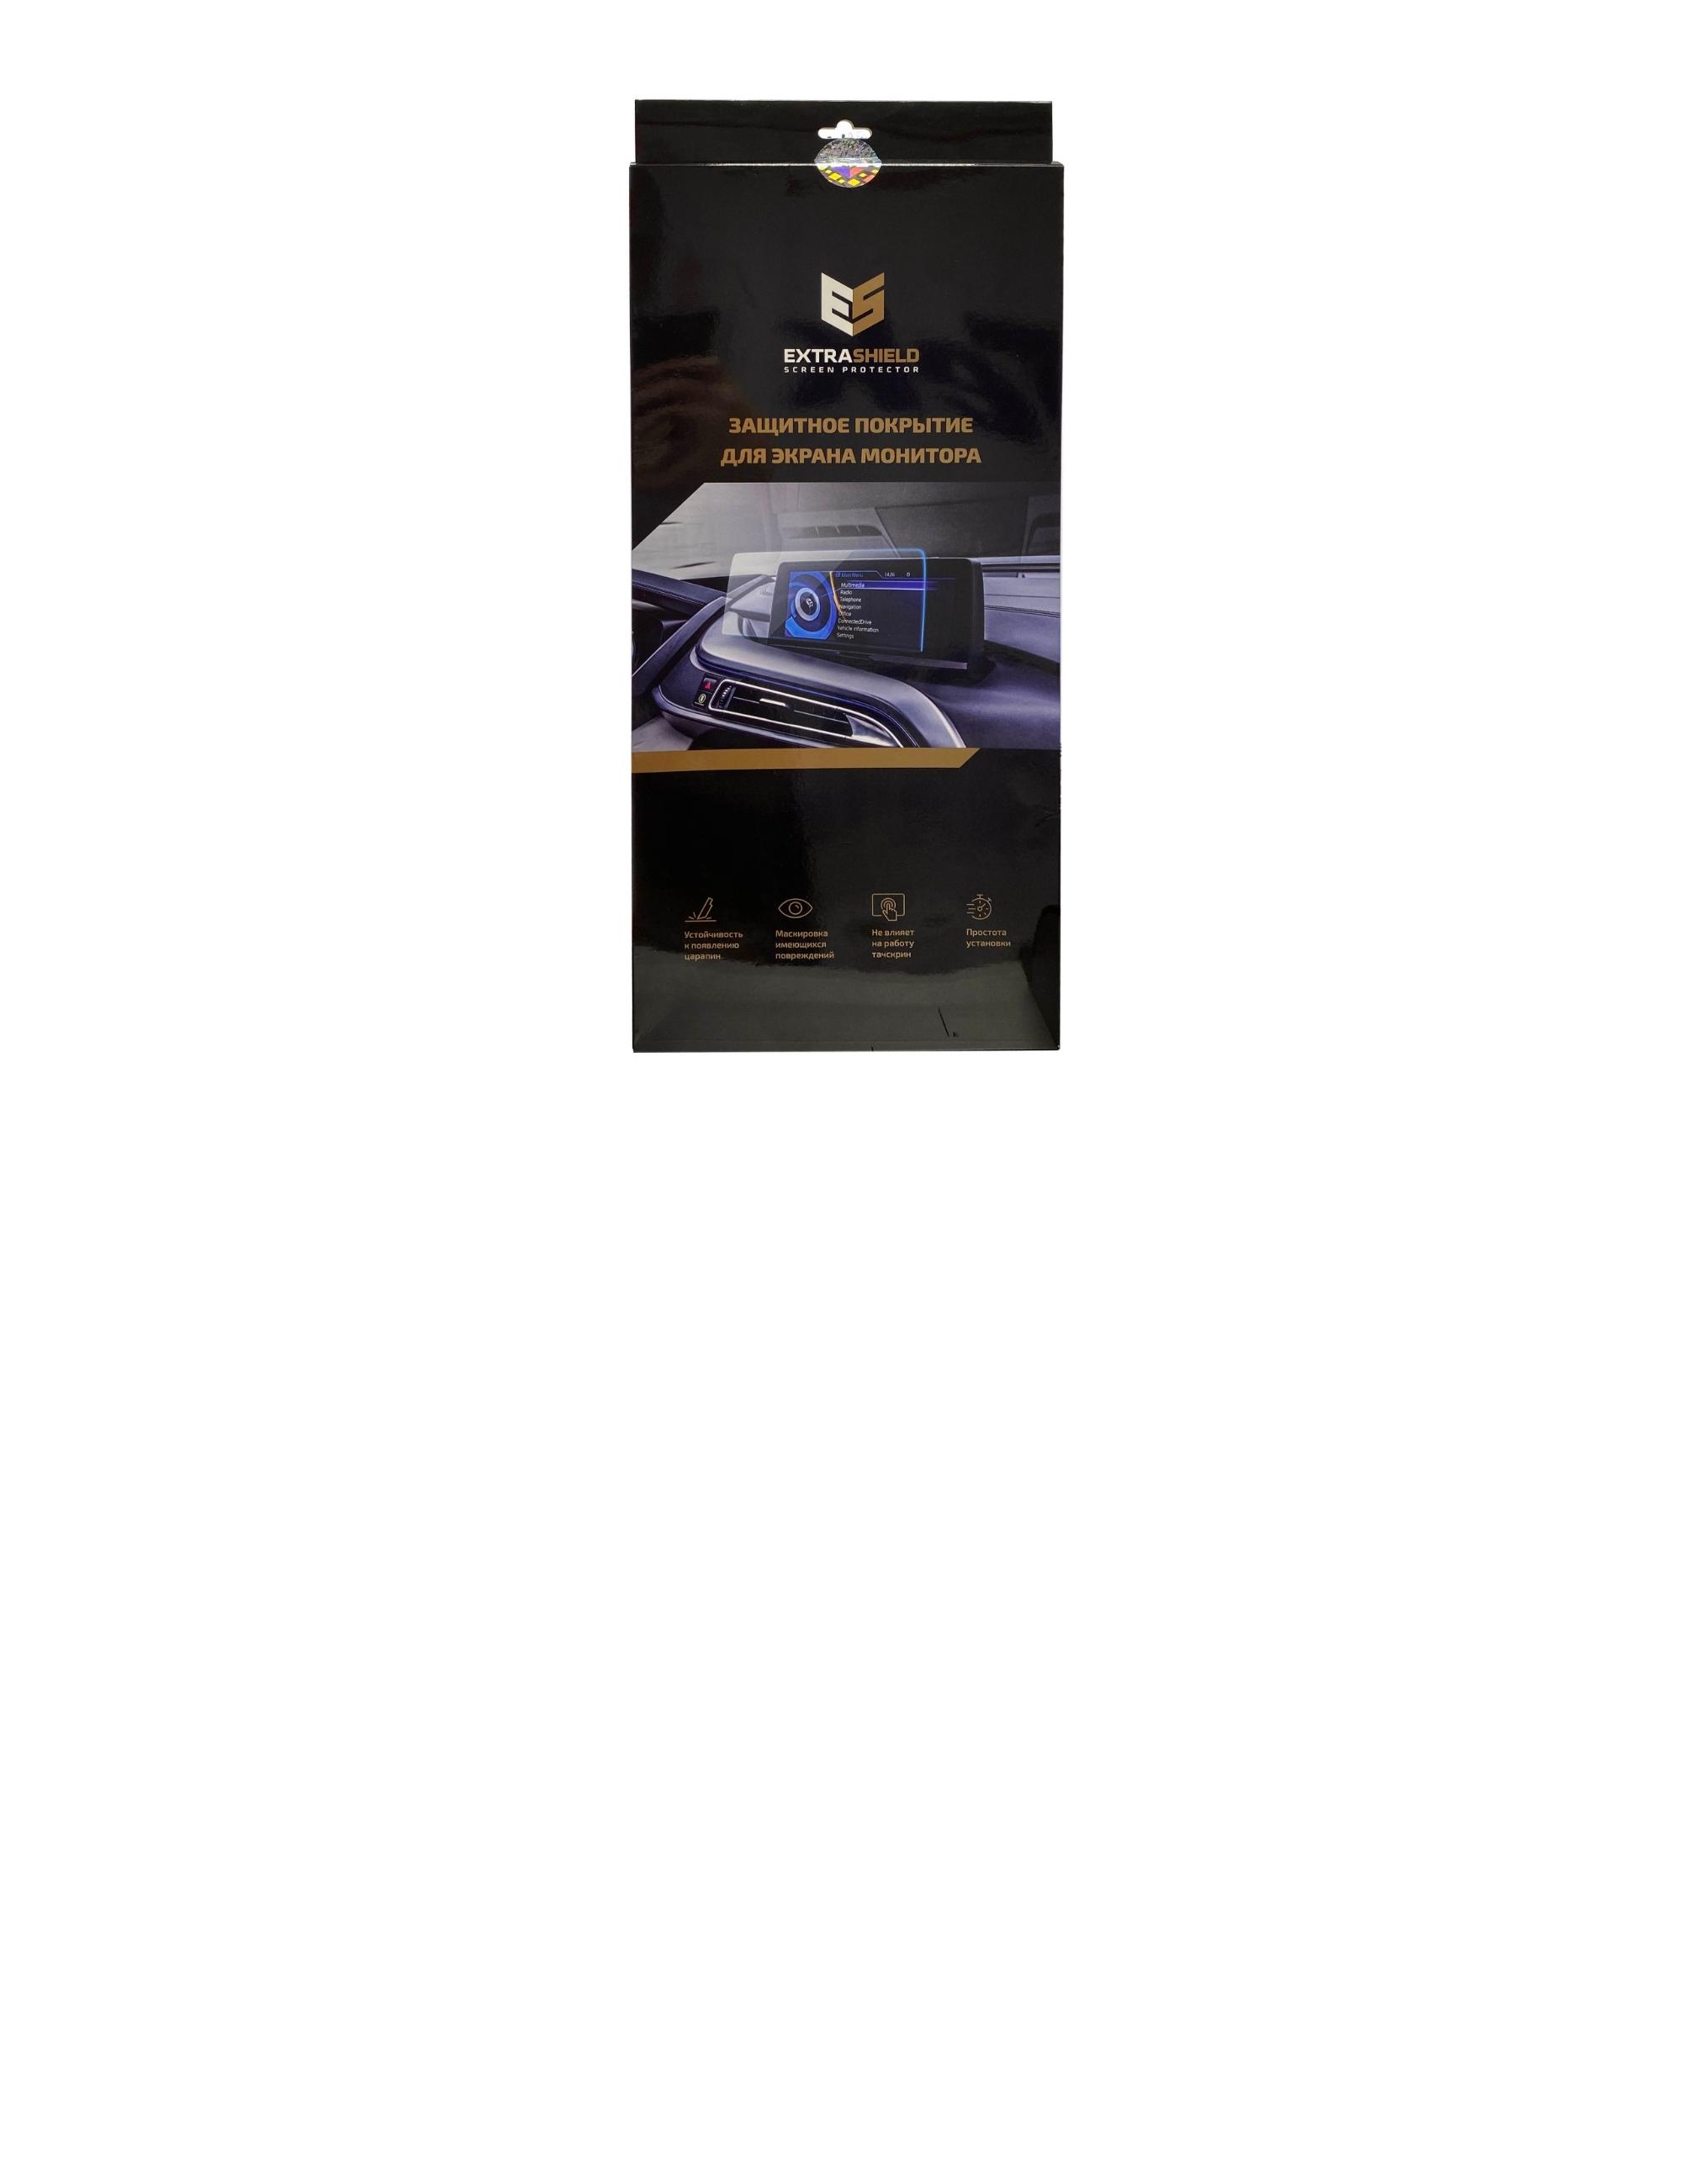 Jeep Renegade 2017 - 2020 мультимедиа 8.4 Защитное стекло Глянец